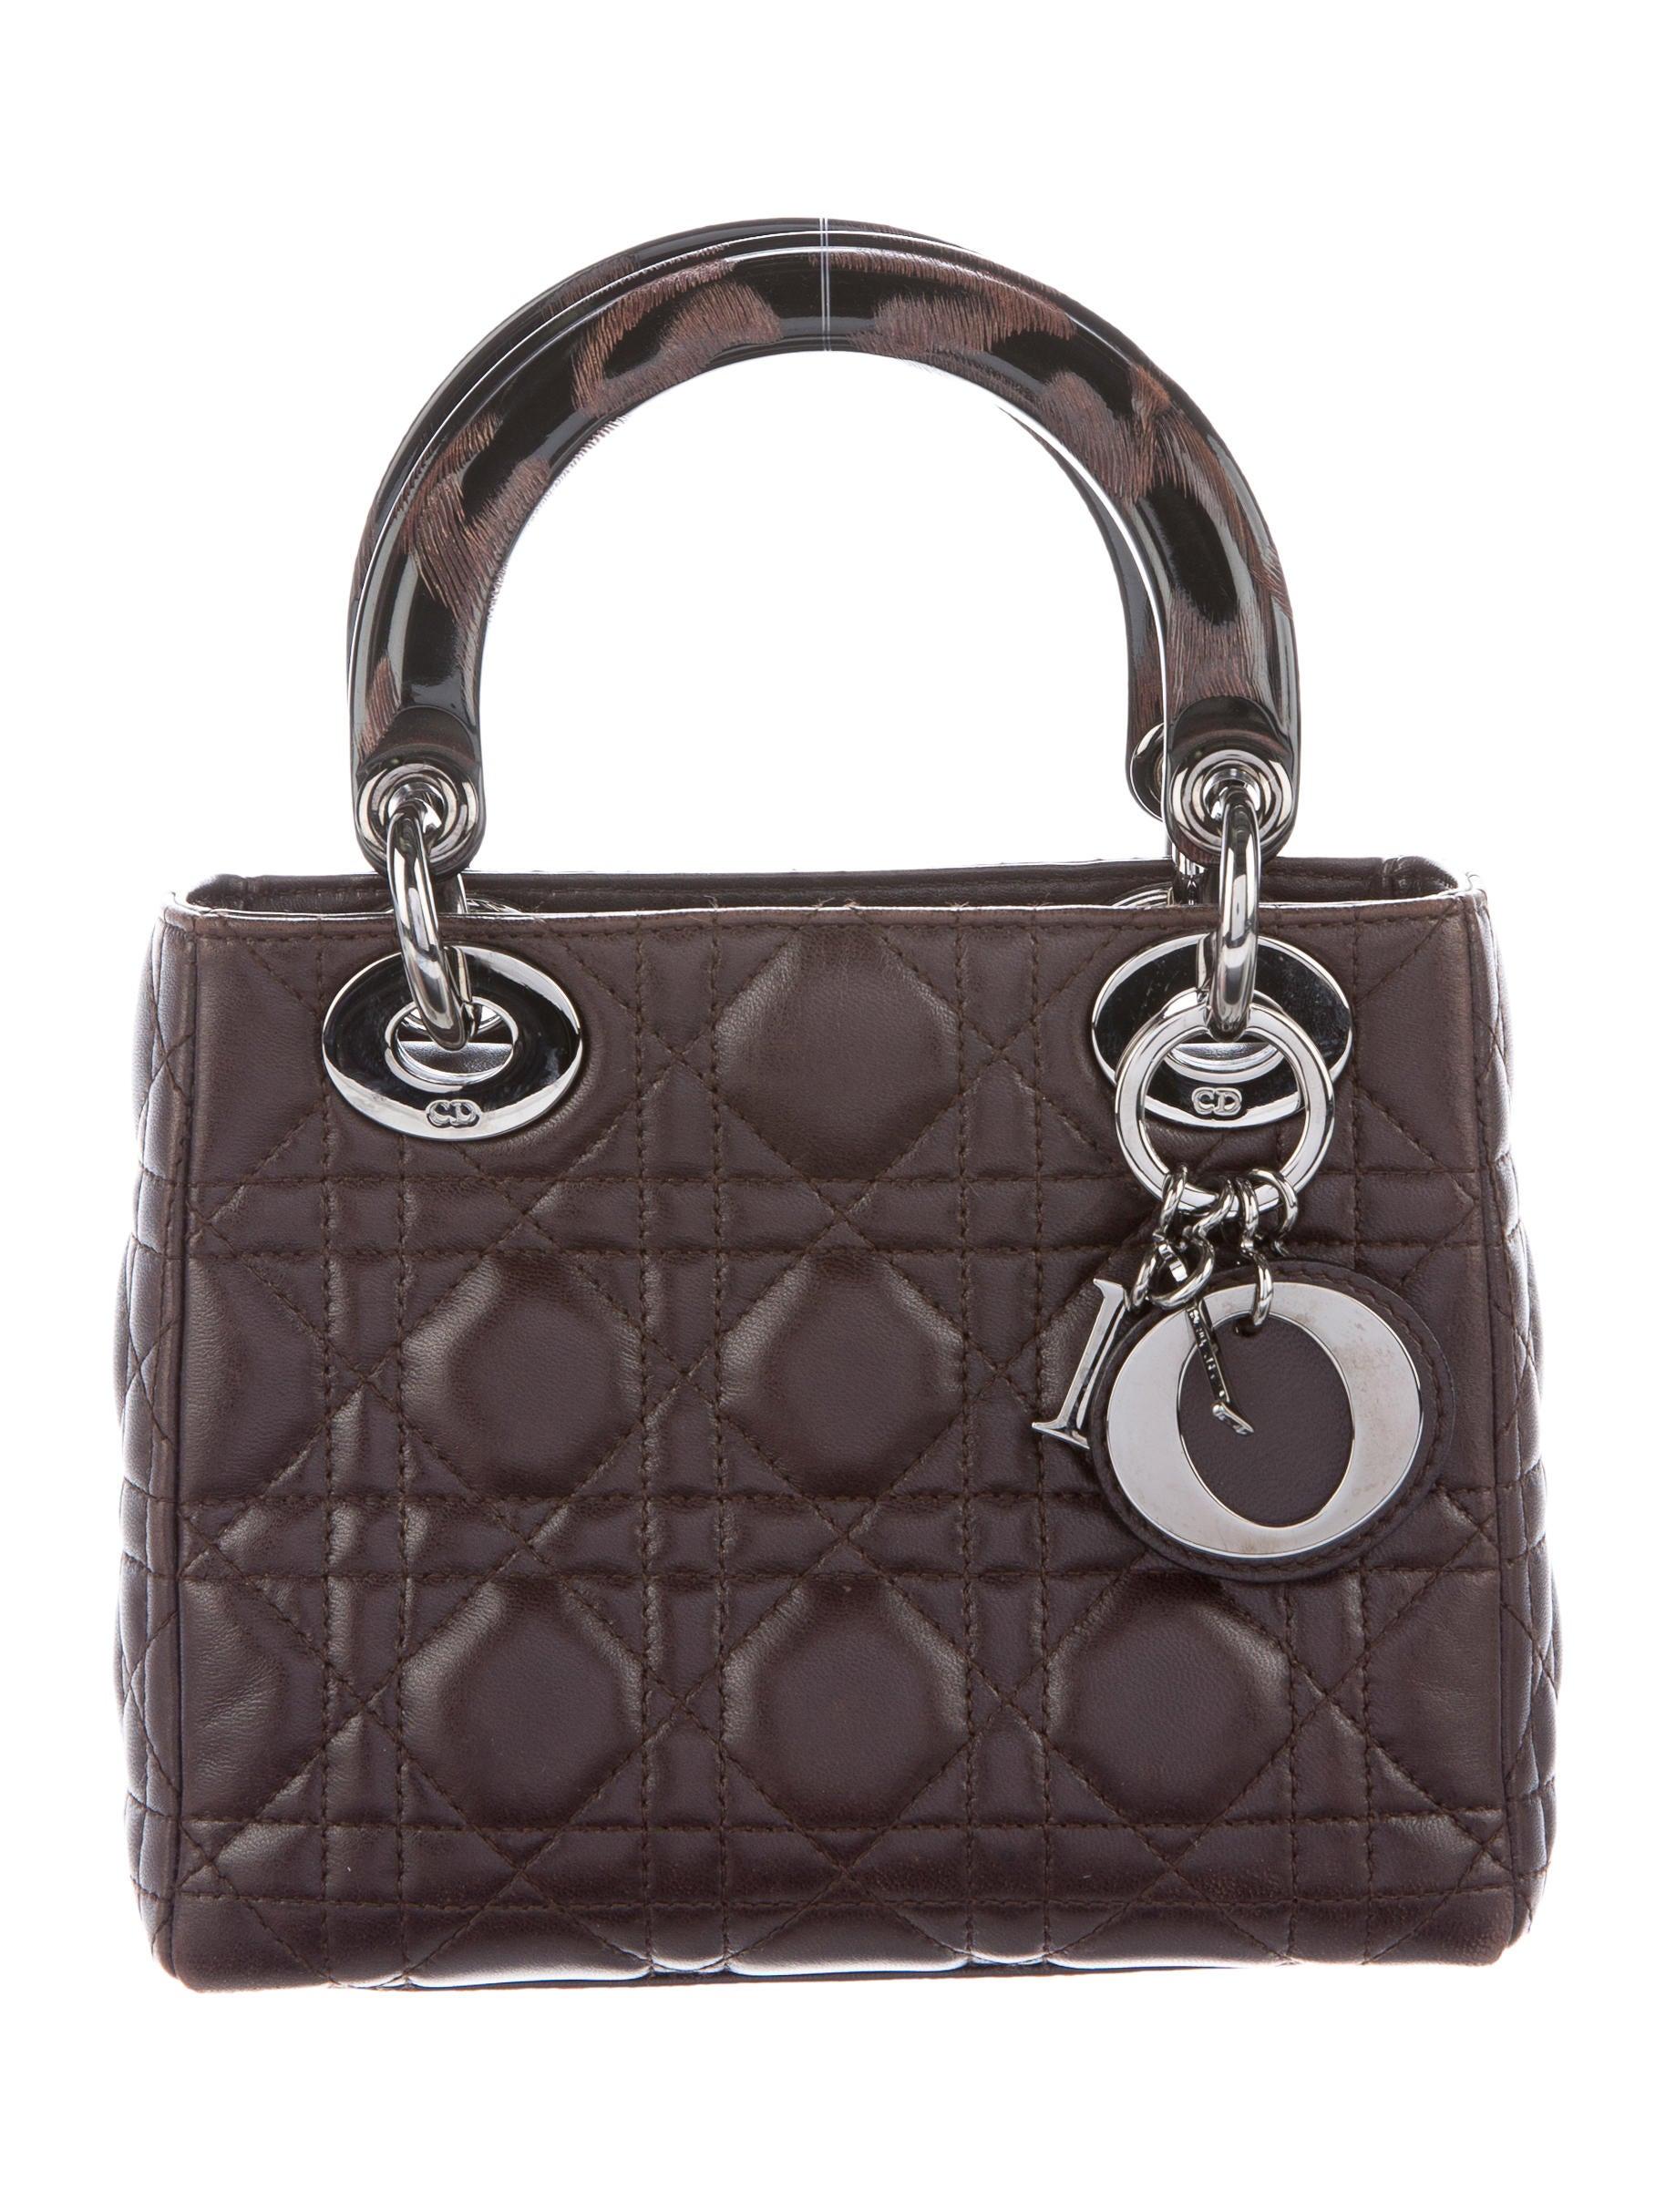 christian dior cannage mini lady dior bag handbags chr46372 the realreal. Black Bedroom Furniture Sets. Home Design Ideas